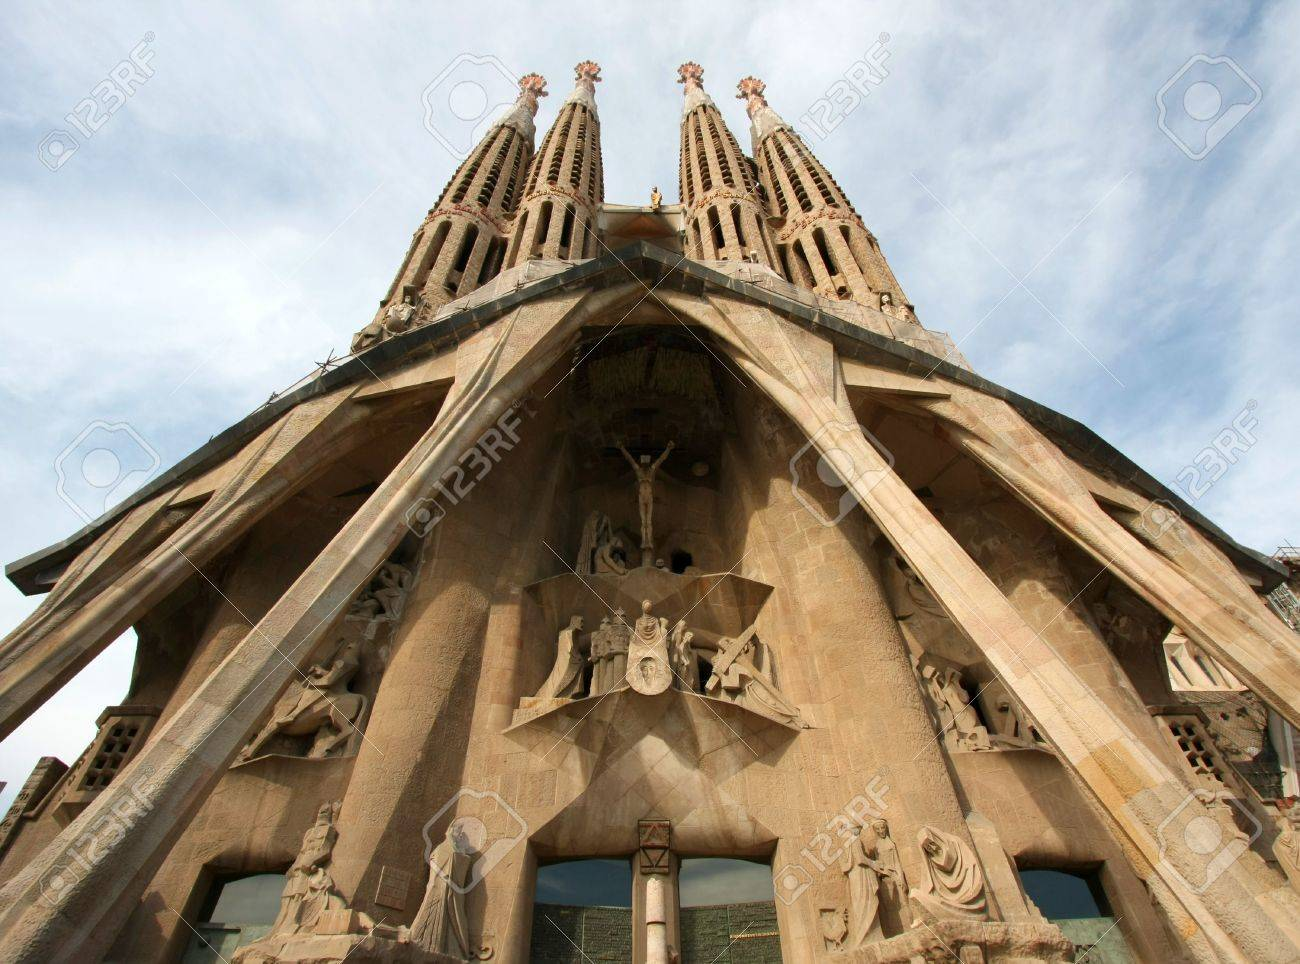 Facade of Sagrada Familia in  Barcelona Spain  Stock Photo - 6342986